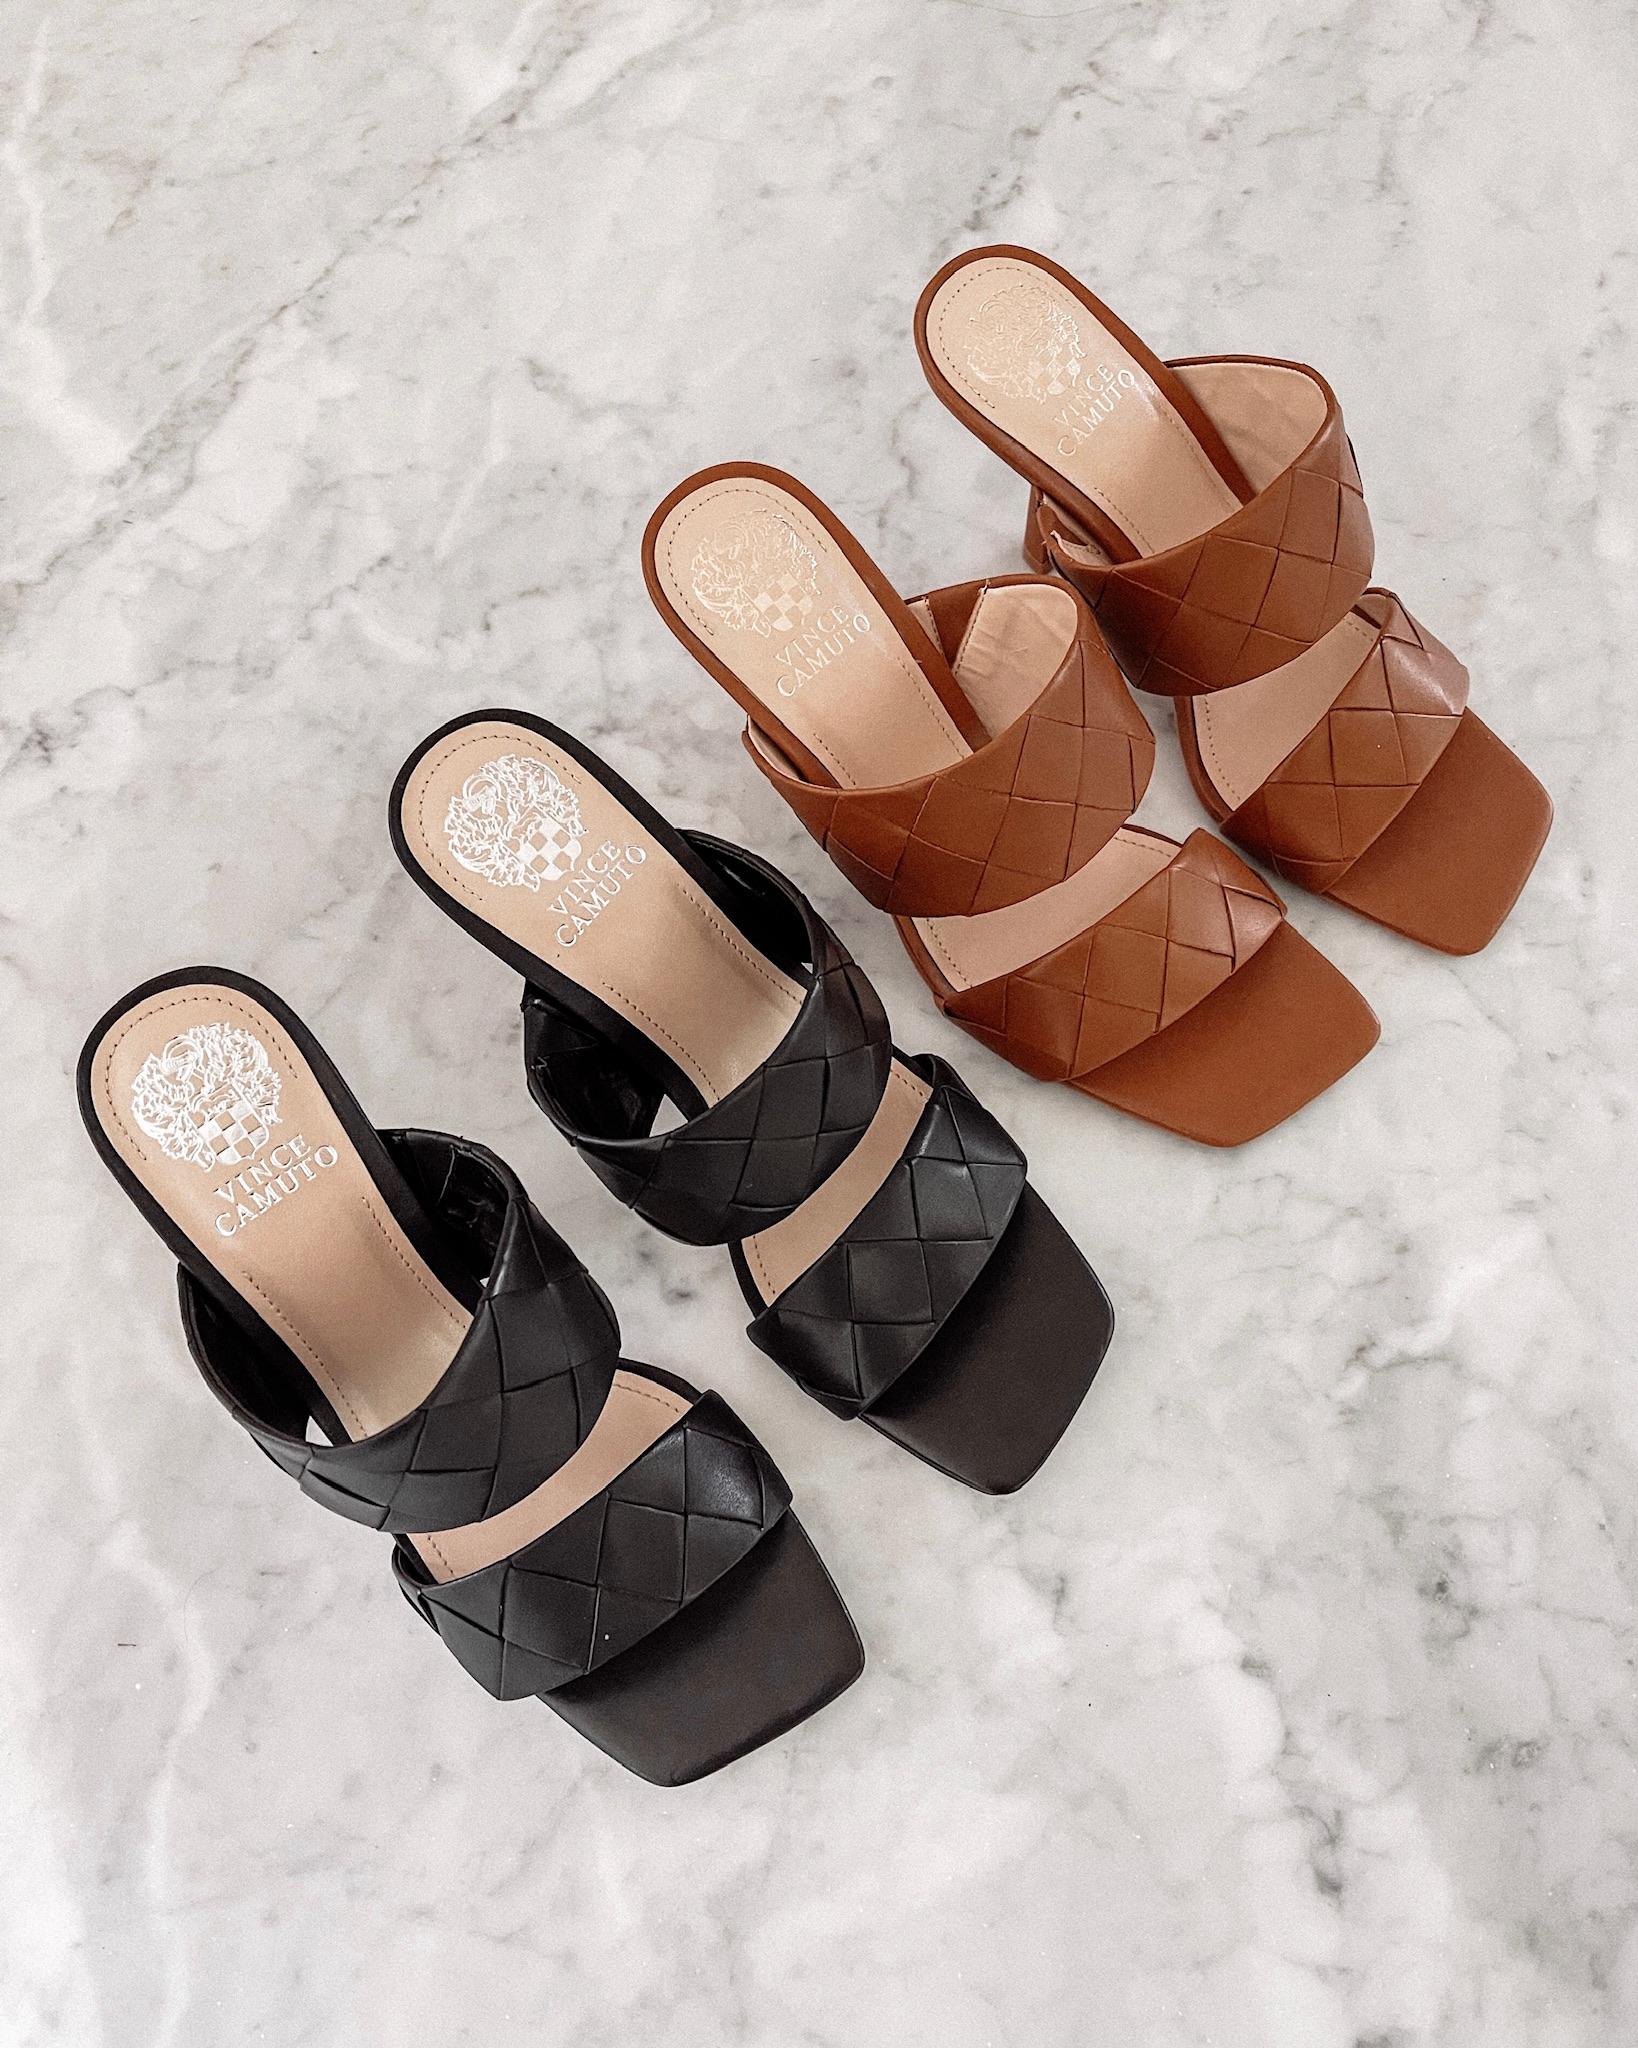 Fashion Jackson Nordstrom Anniversary Sale Candialia Sandals